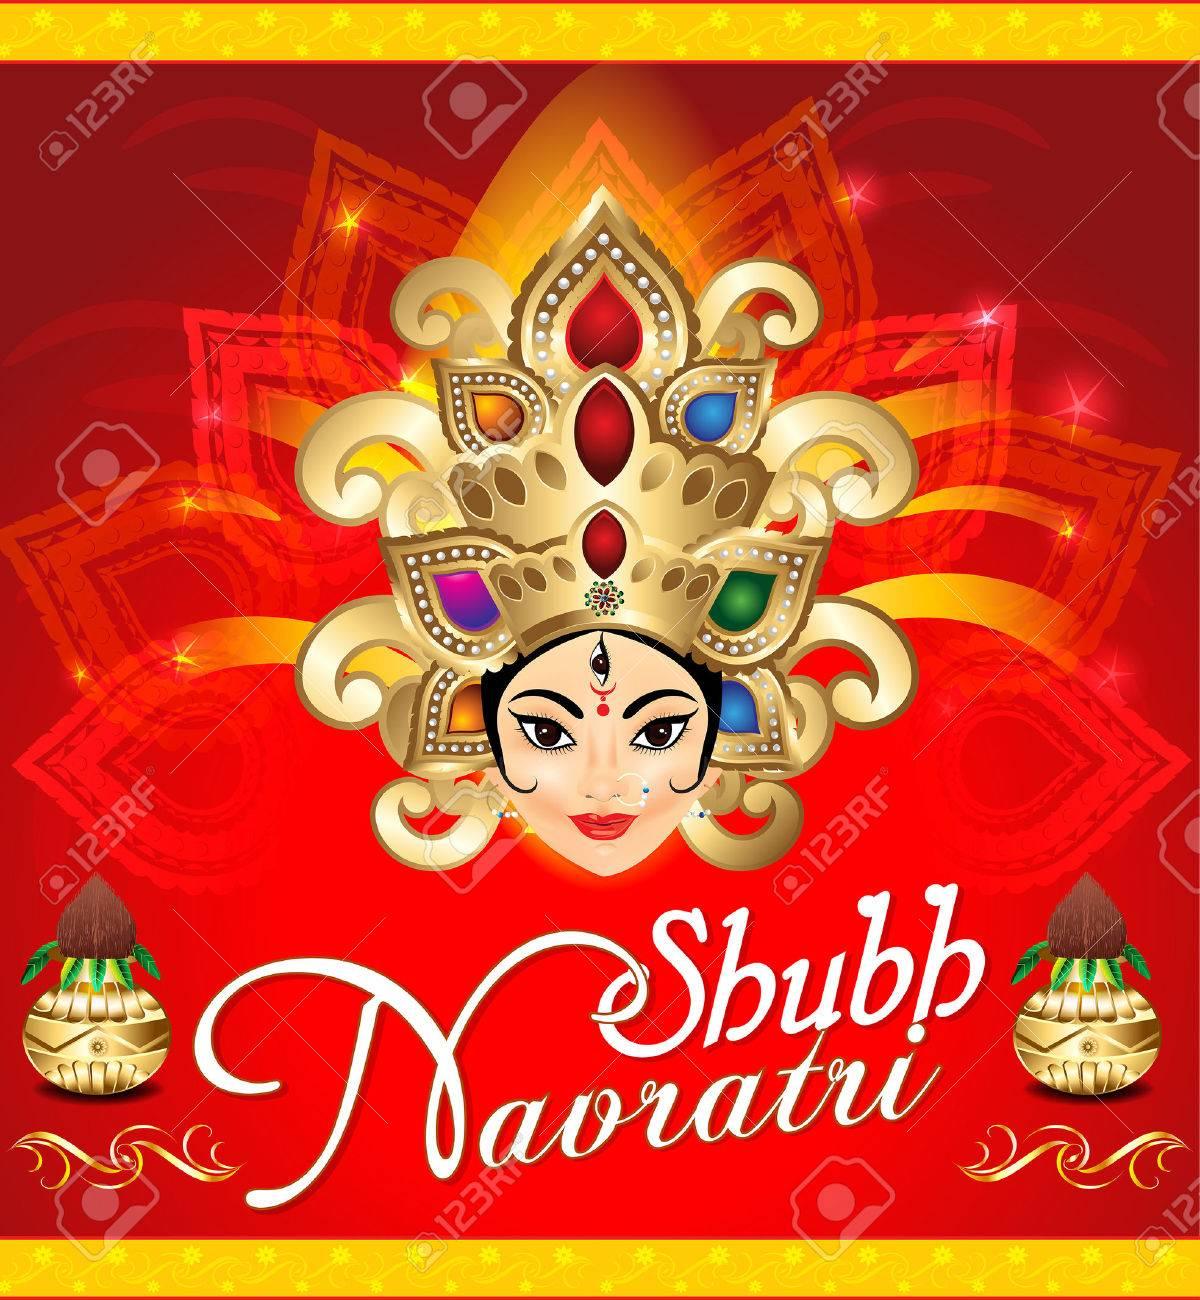 Happy Navratri Celebration Background With Face Of Goddess Durga